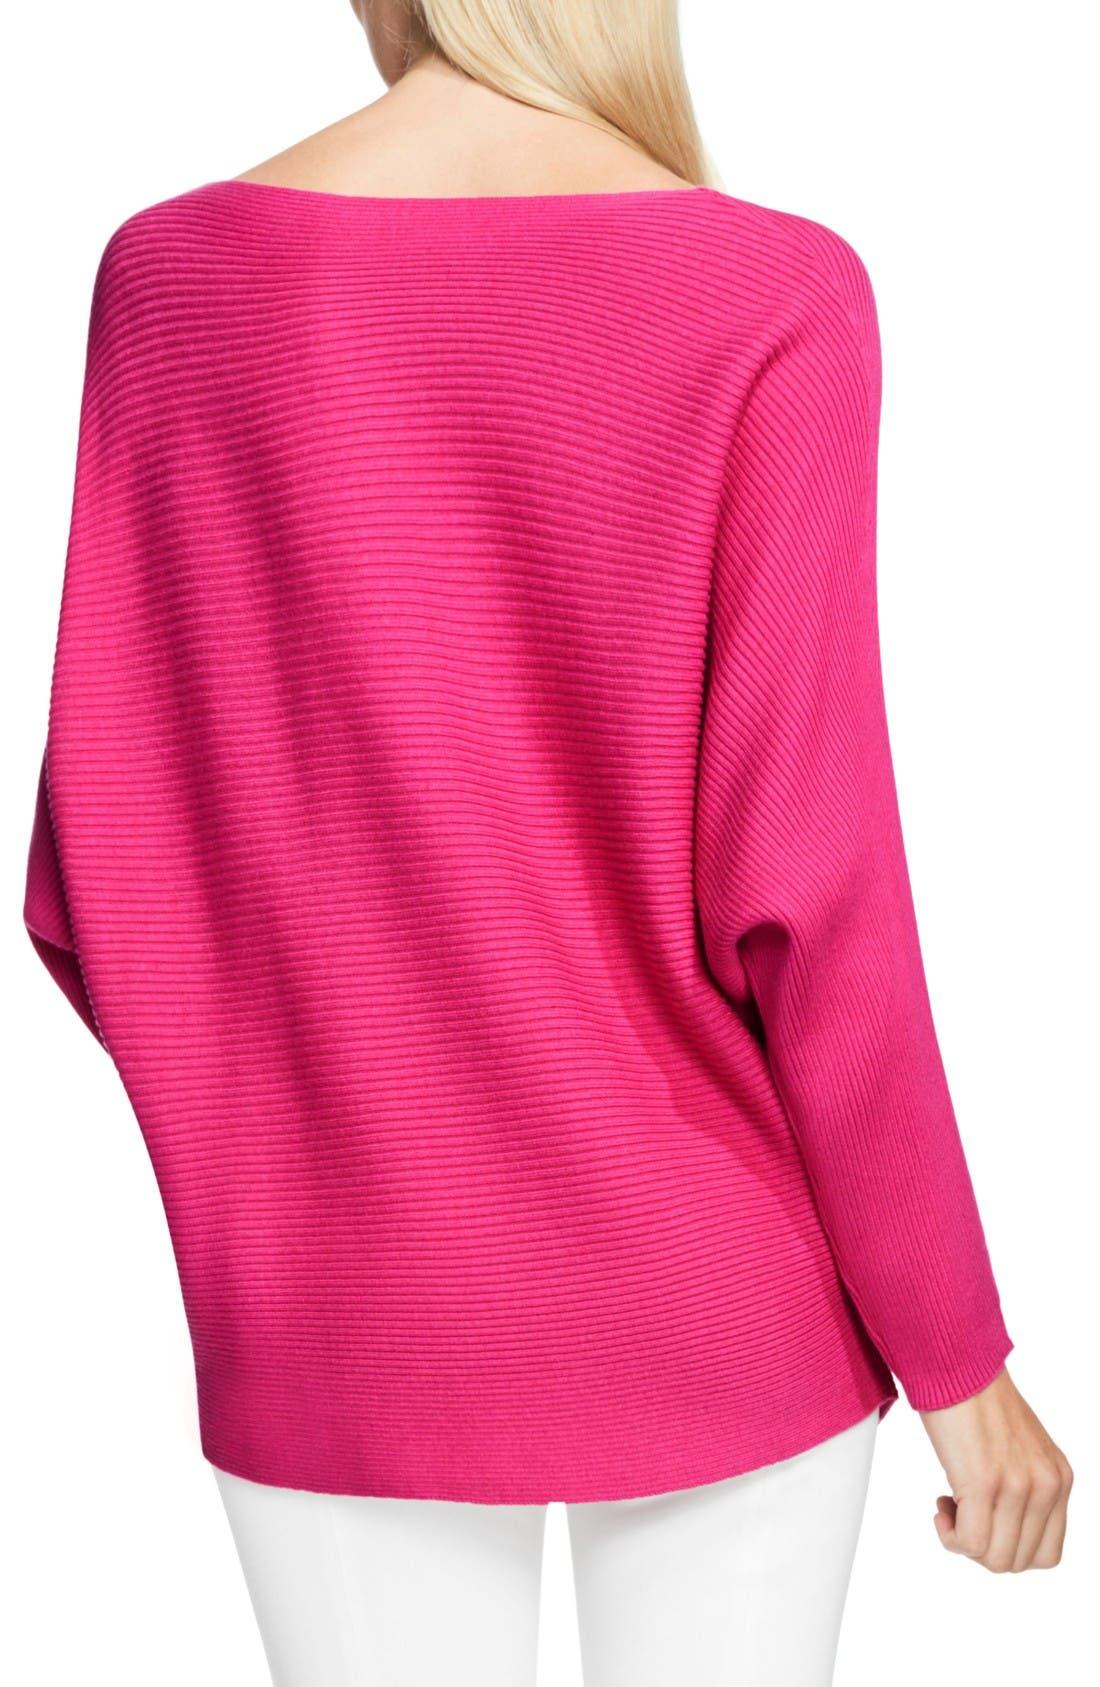 Alternate Image 2  - Vince Camuto Rib Knit Dolman Sweater